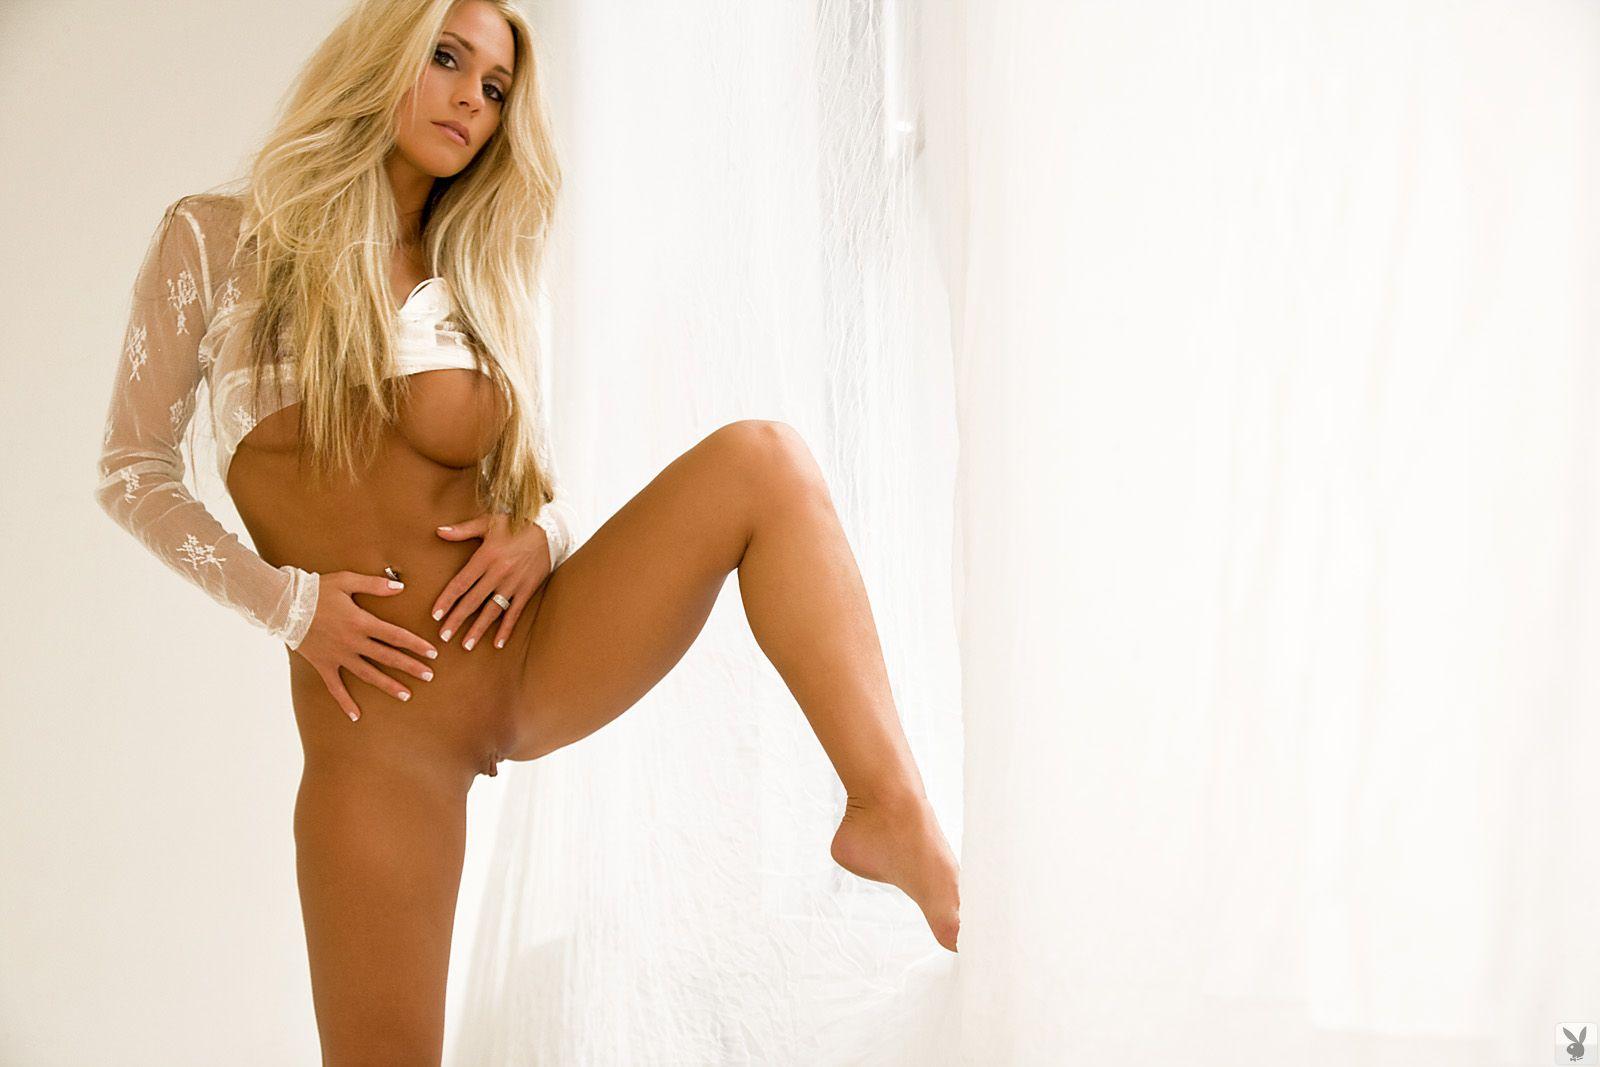 Alyssa Marie: Alyssa Marie diosa Playboy USA